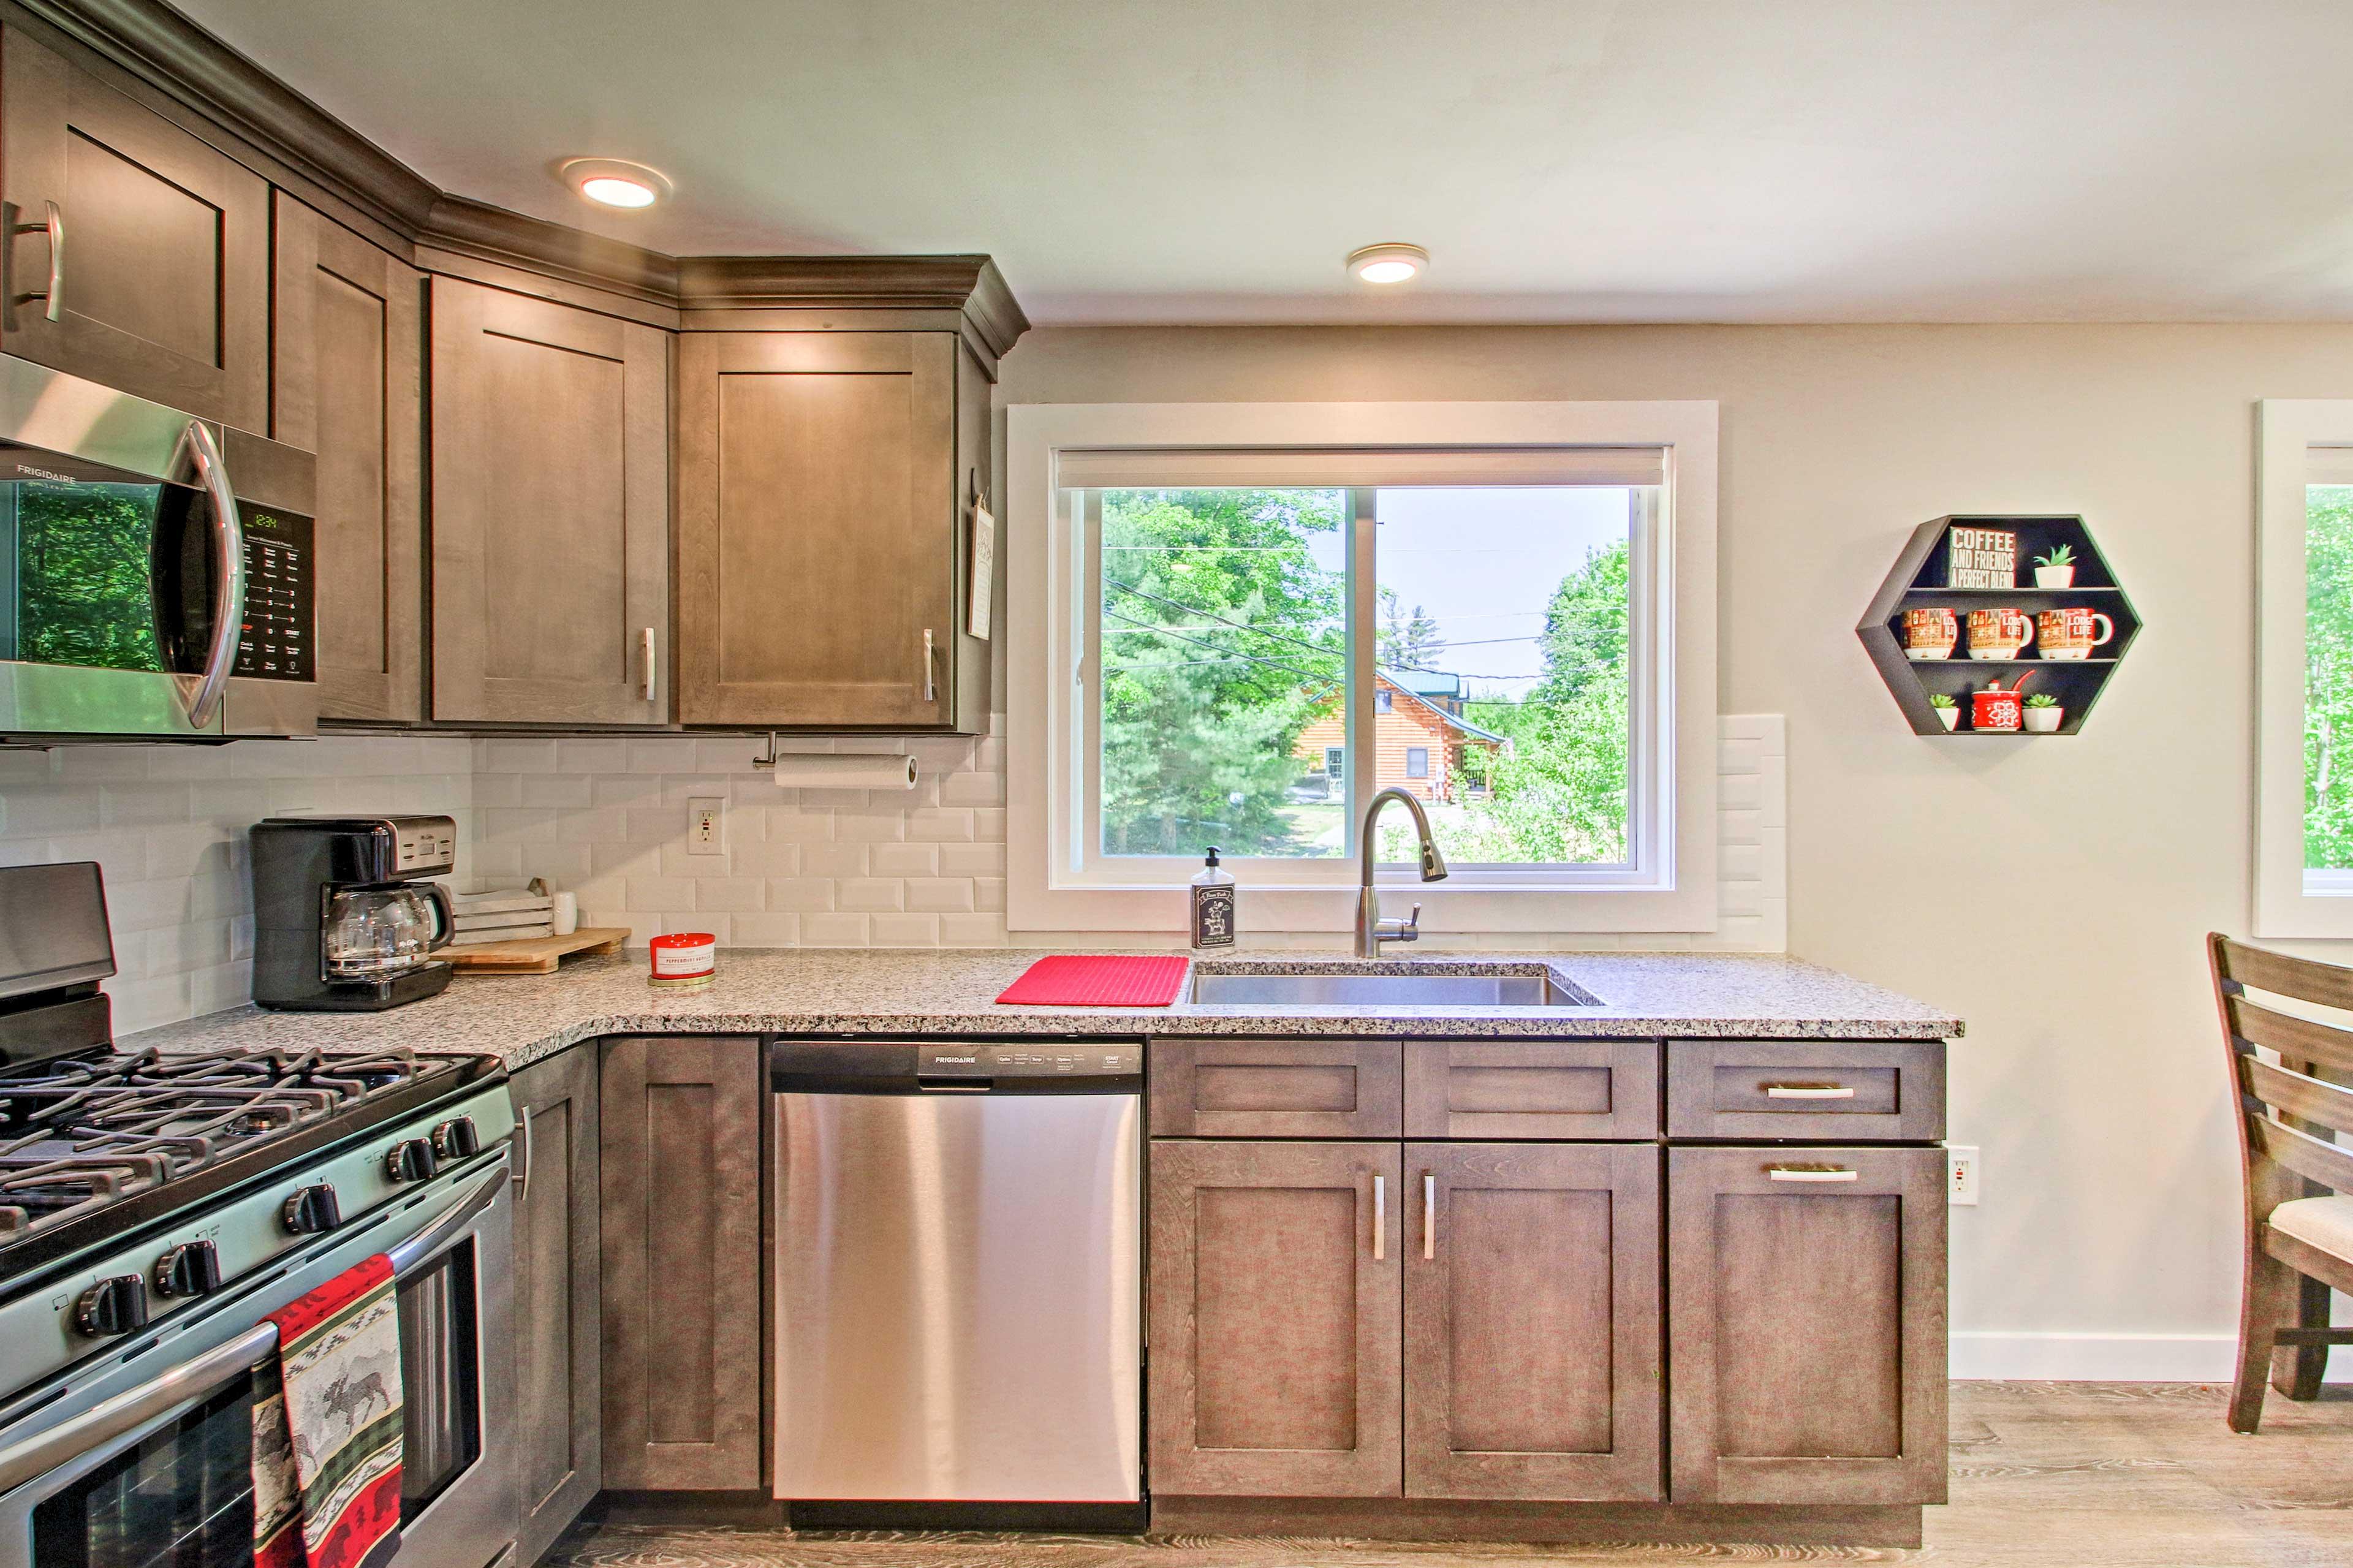 Appliances provided include a drip coffeemaker, blender, & crock pot.